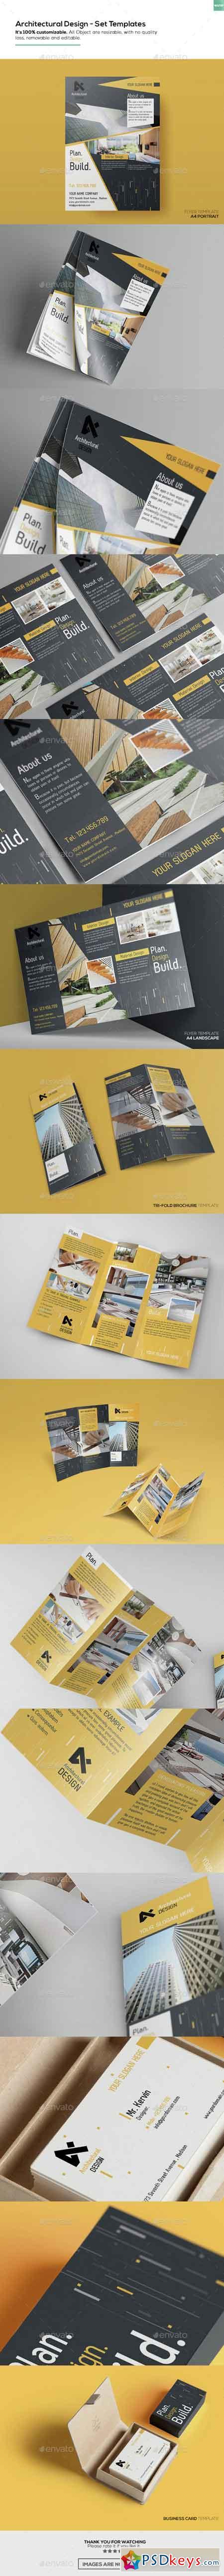 Architectural Design - Set Templates 15312640